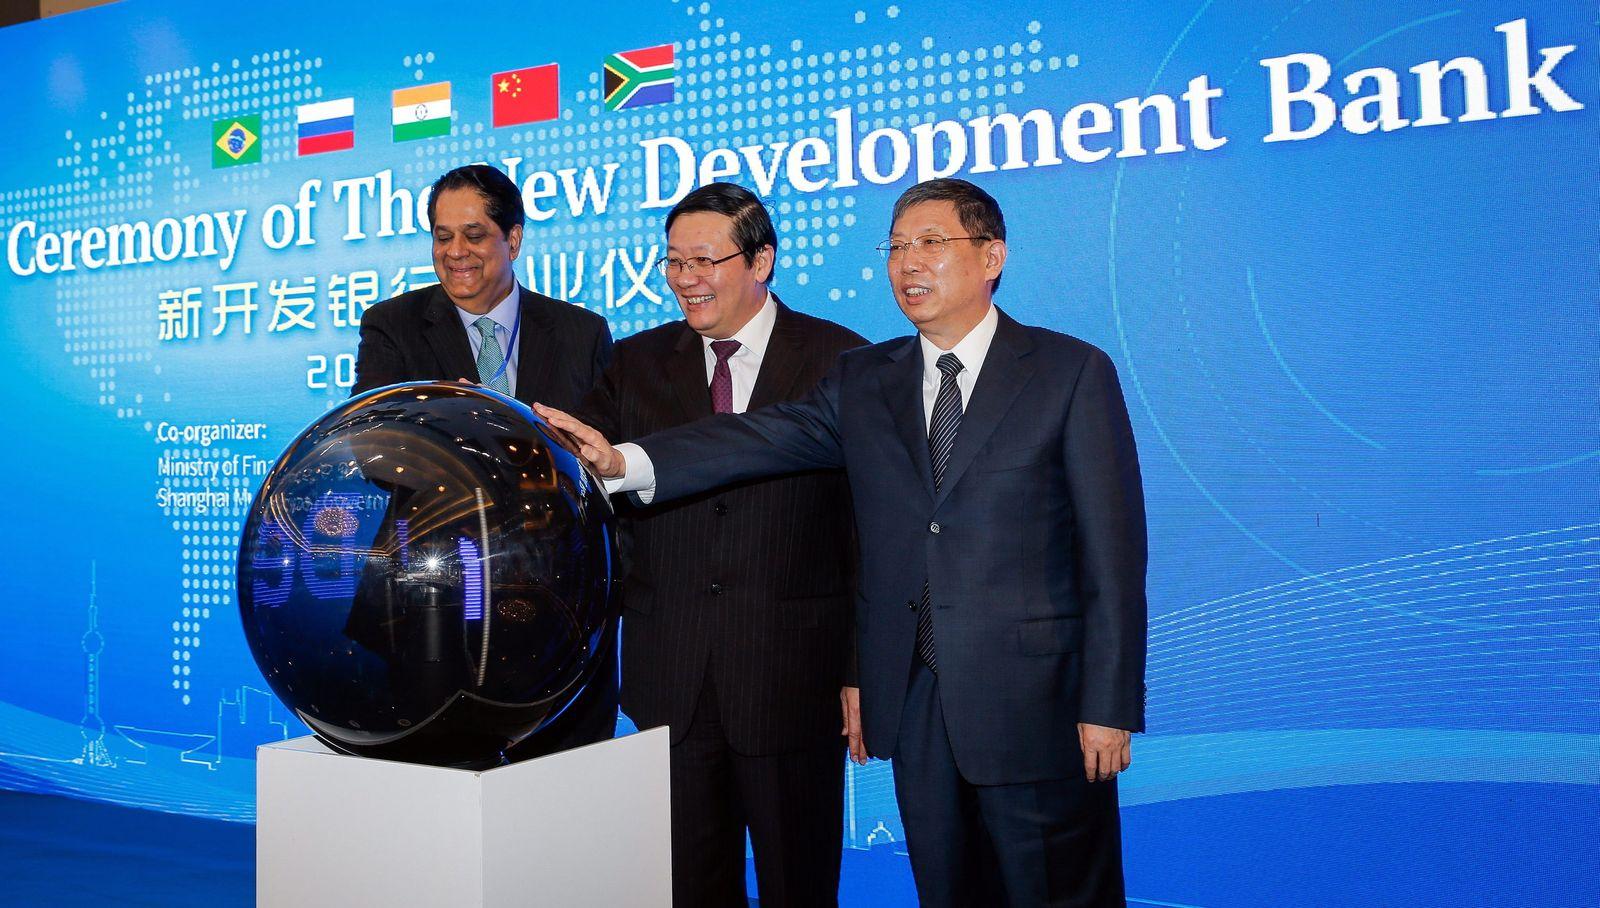 New Development Bank of BRICS states opens in Shanghai